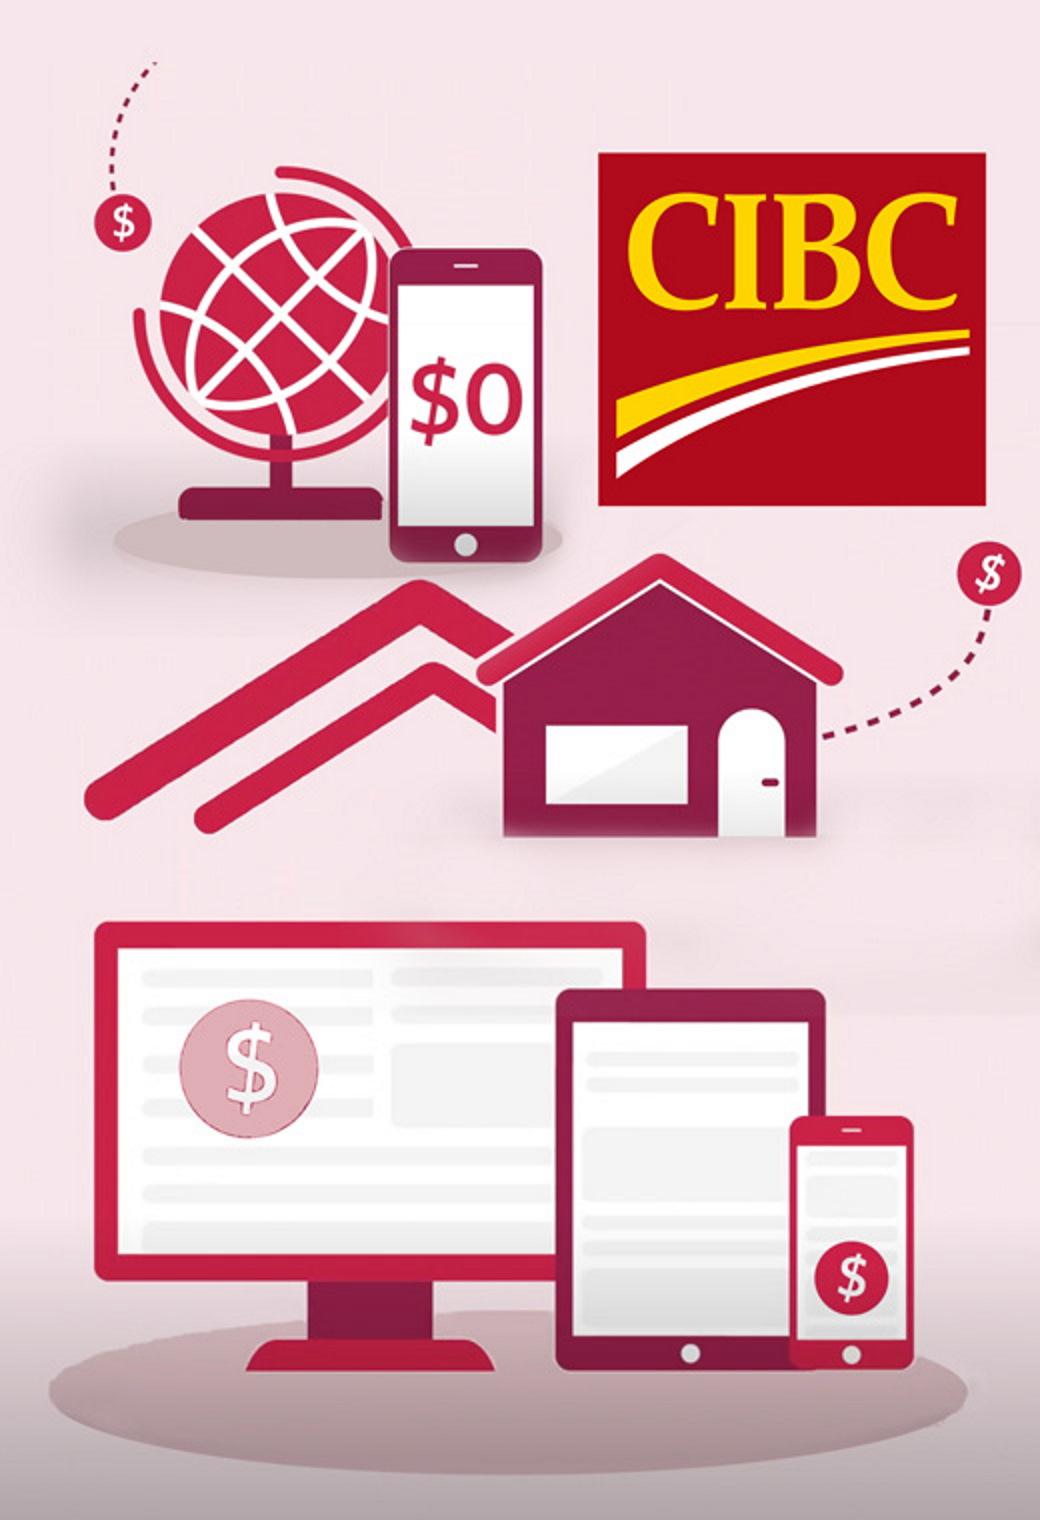 CIBC-Commercial-Poster